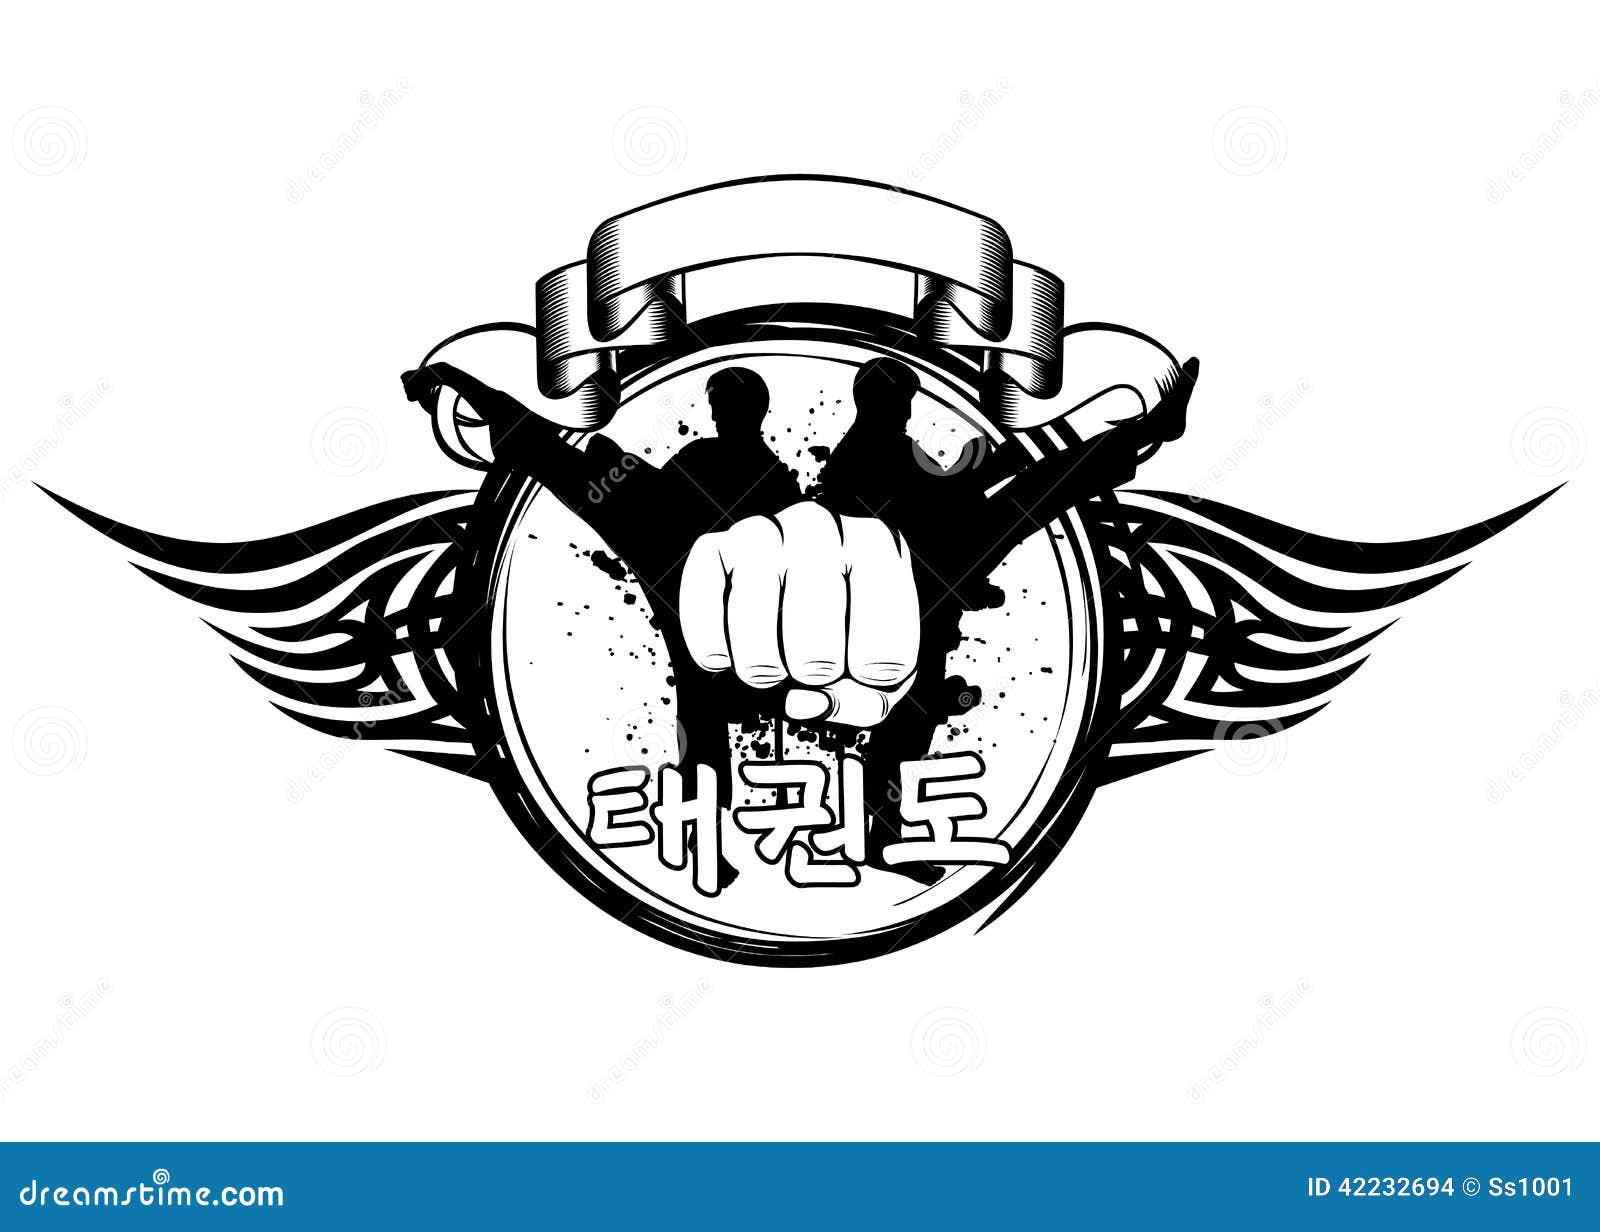 Taekwondo Stock Vector - Image: 42232694